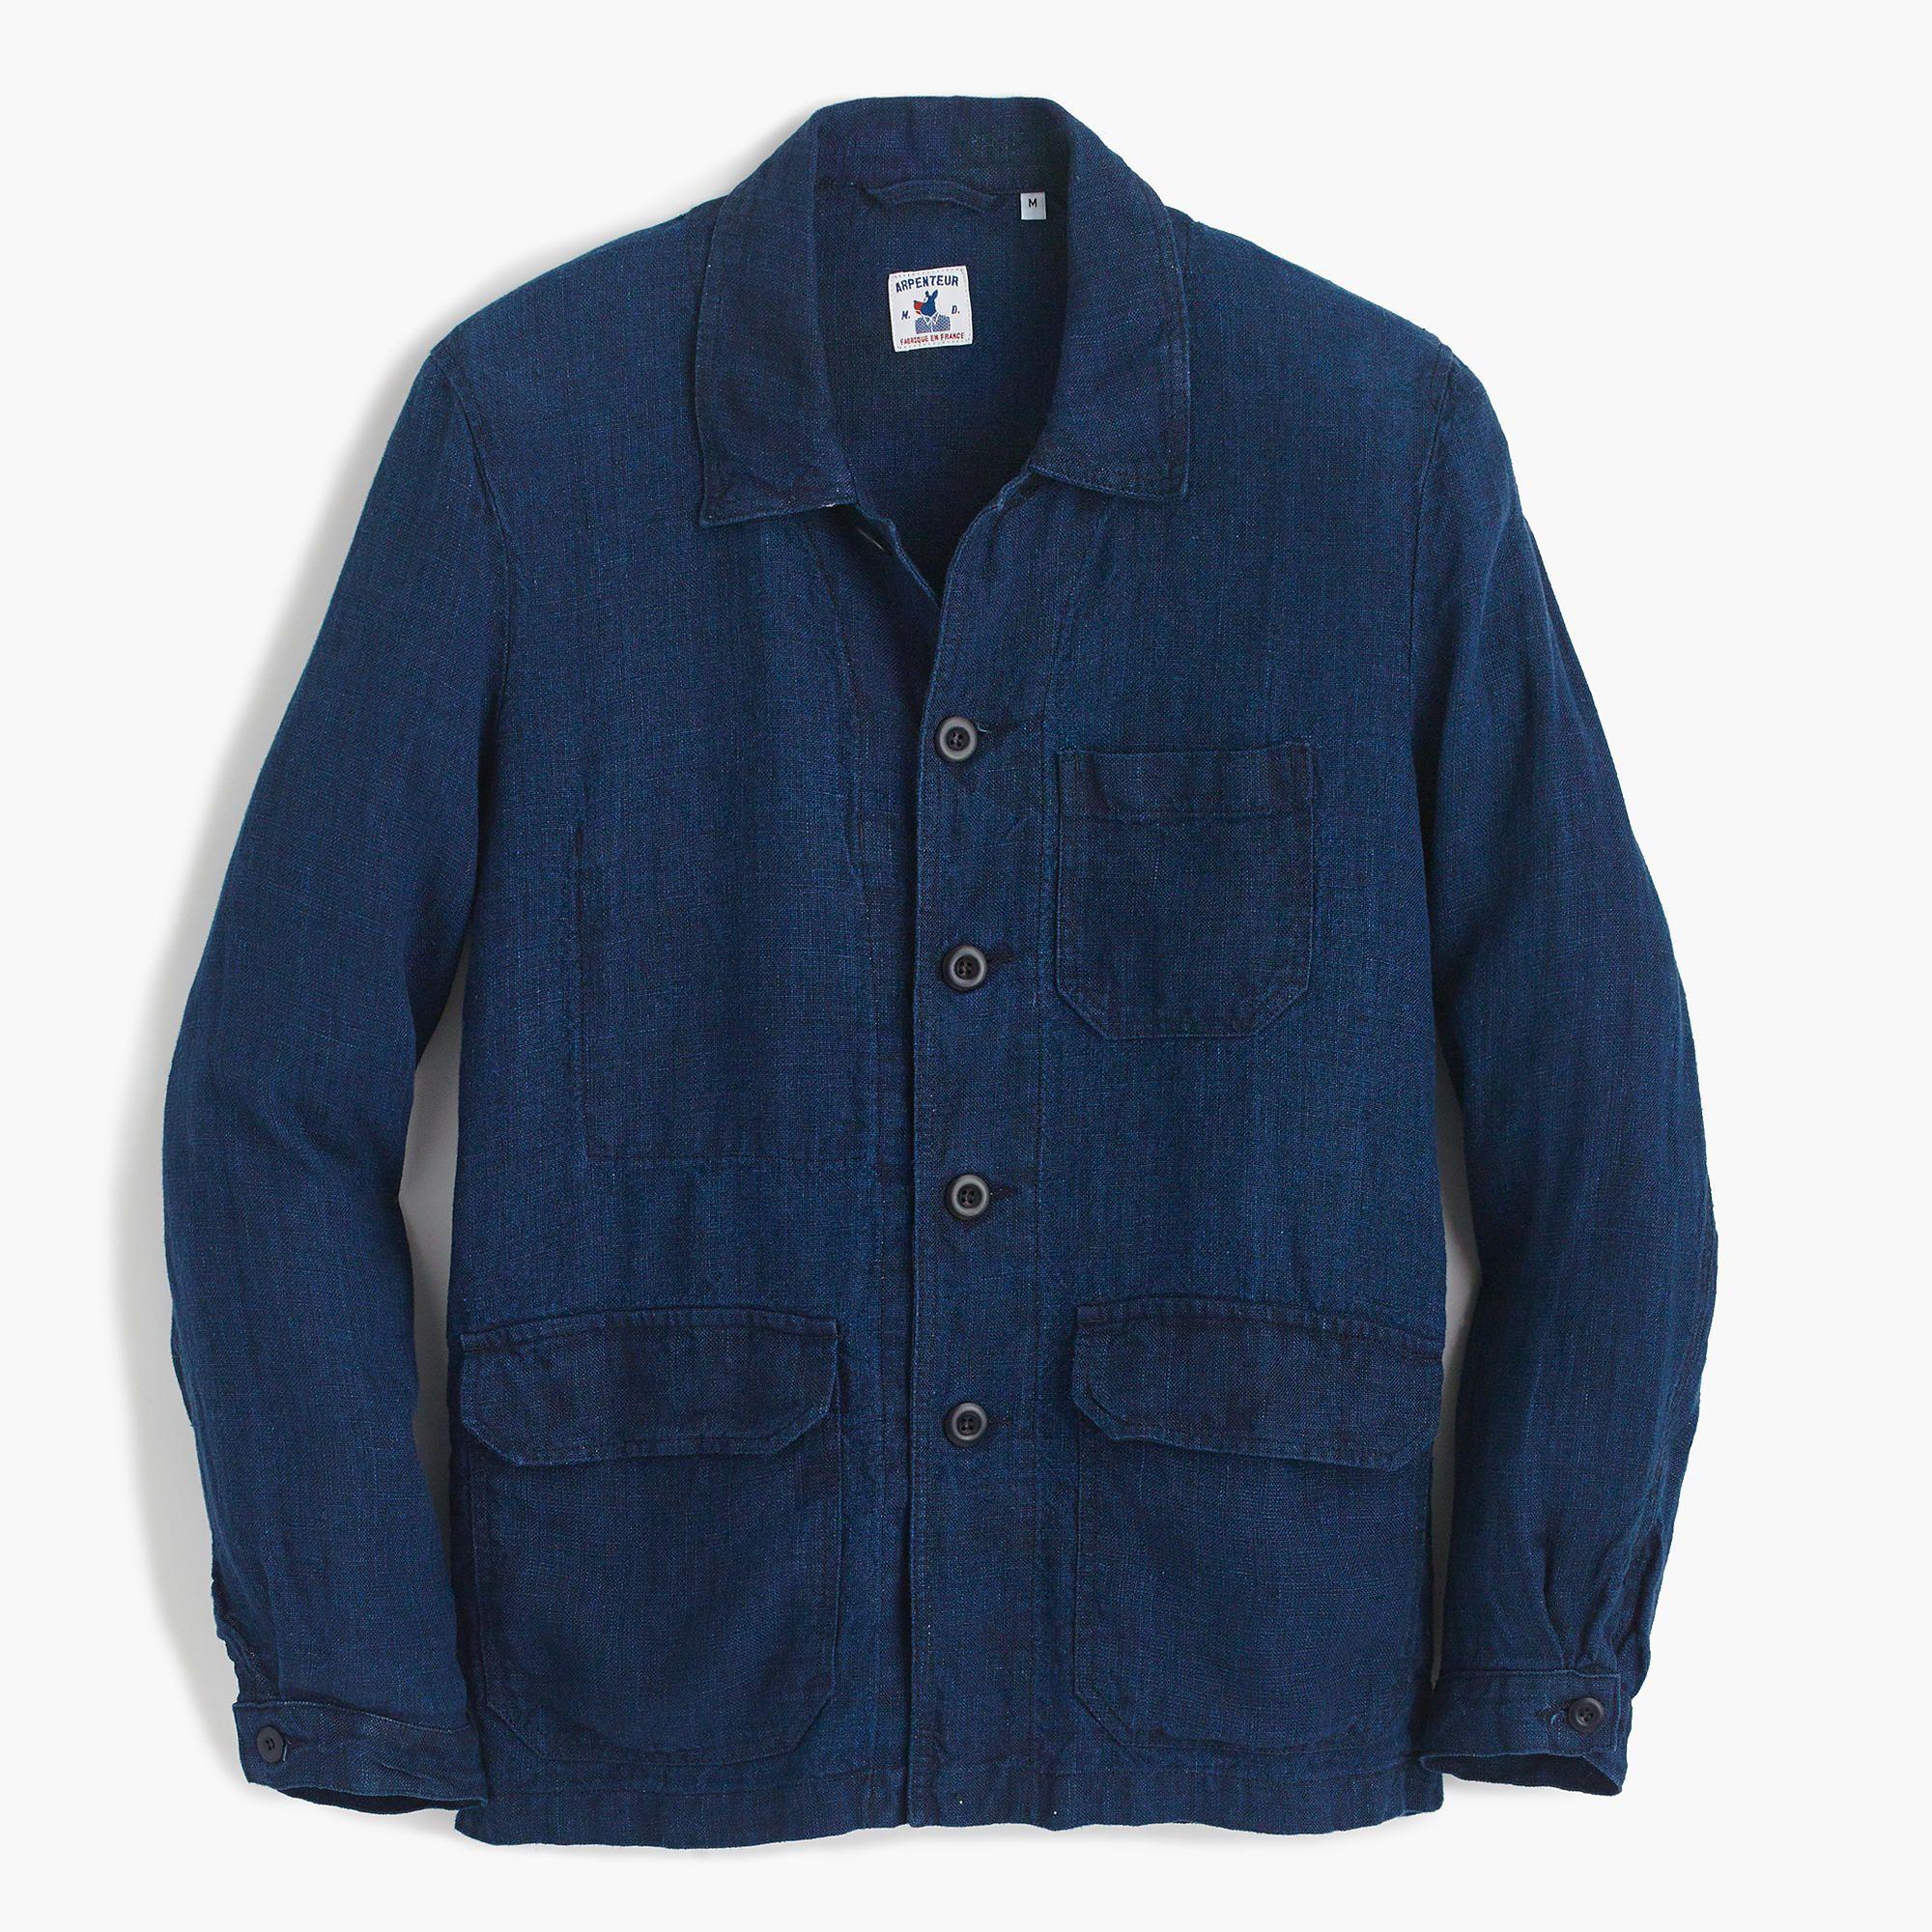 Arpenteur™ travail jacket | Workwear vintage, Workwear